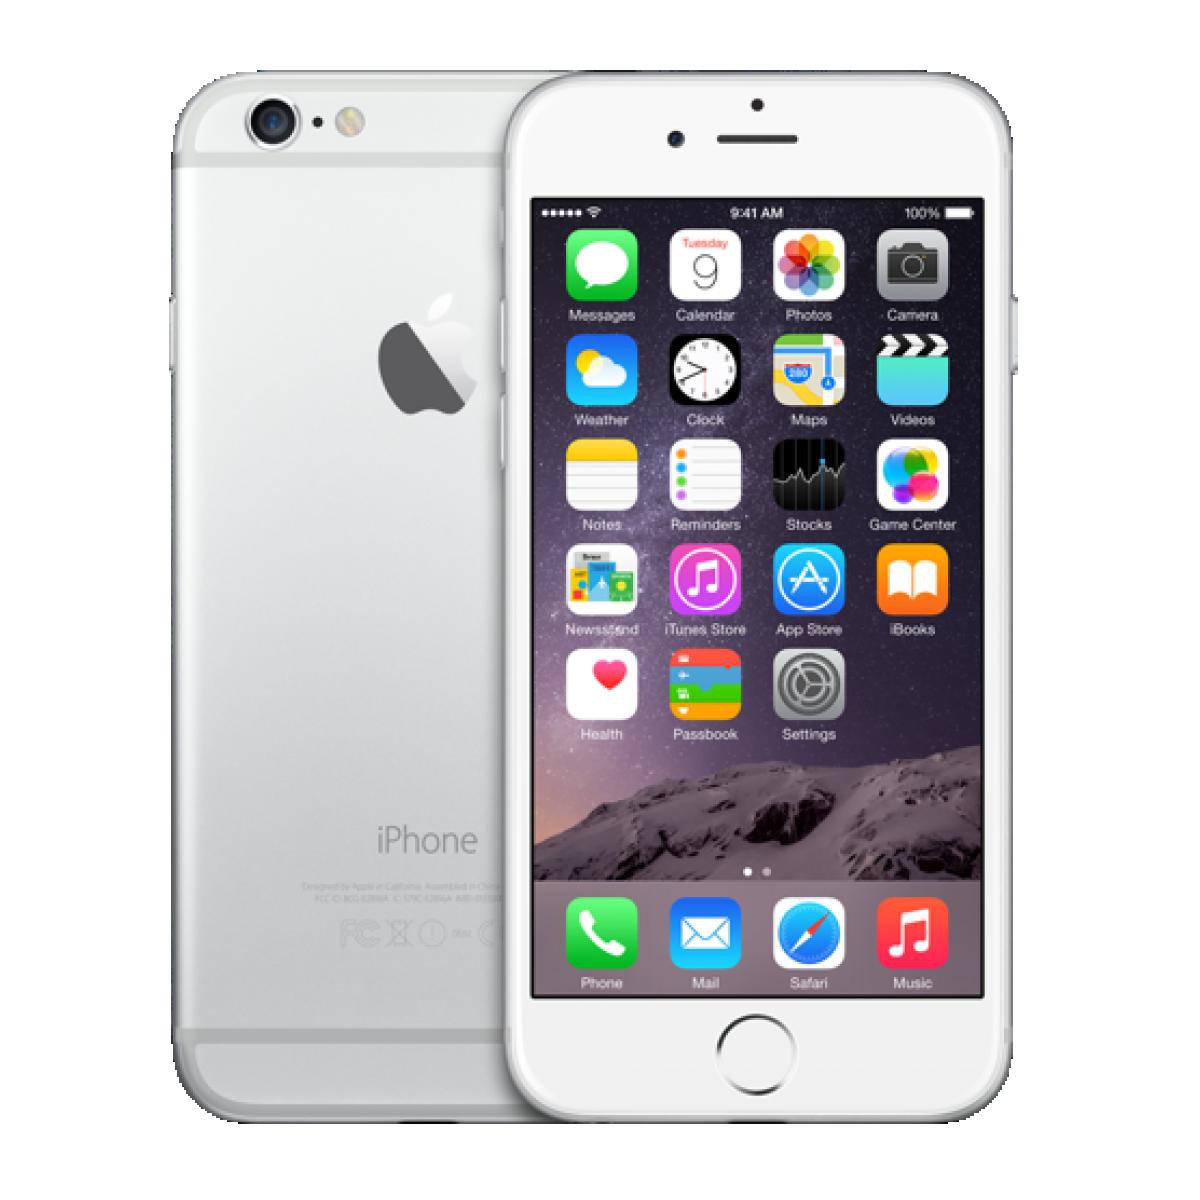 techie, verizon 4g smartphones for sale no contract posting